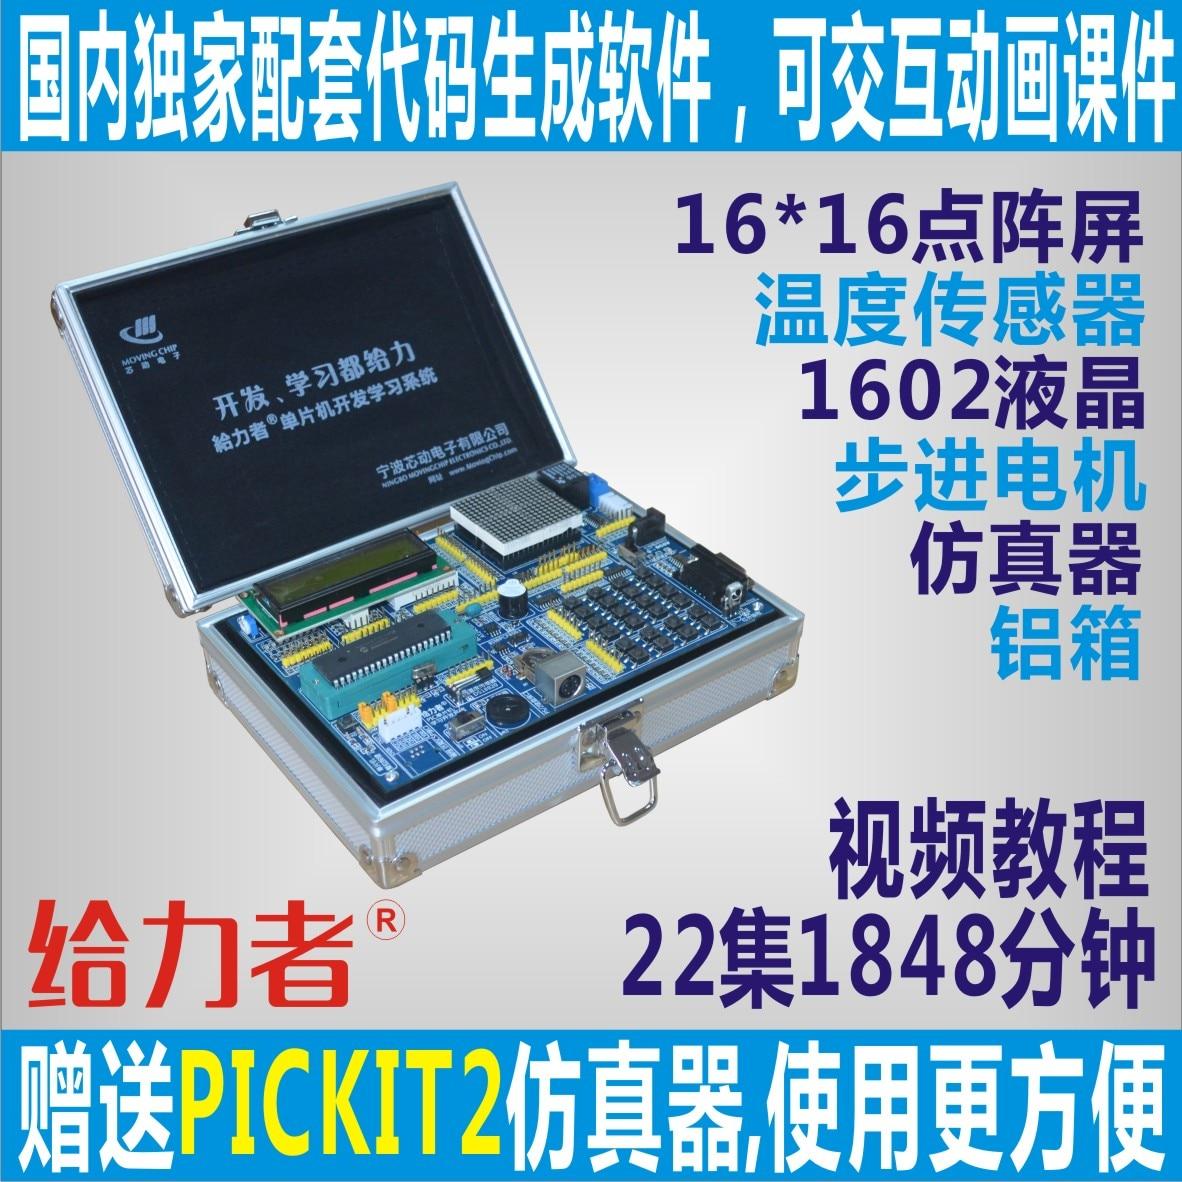 Leader PIC Microcontroller Development Board Learning Board Video Tutorial PICKIT2 Emulator microcontroller